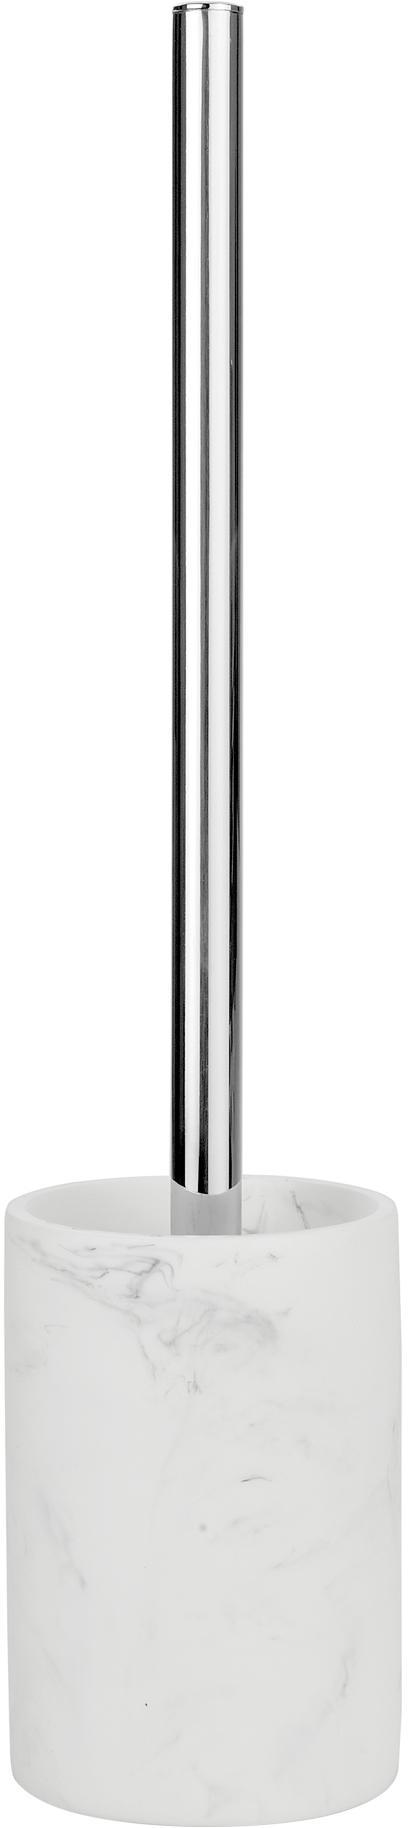 Toilettenbürste Swan in Marmor-Optik, Behälter: Kunststoff (Polyresin), Griff: Kunststoff (Plastik), Behälter: Weiss, marmoriertGriff: Silberfarben, Ø 9 x H 40 cm